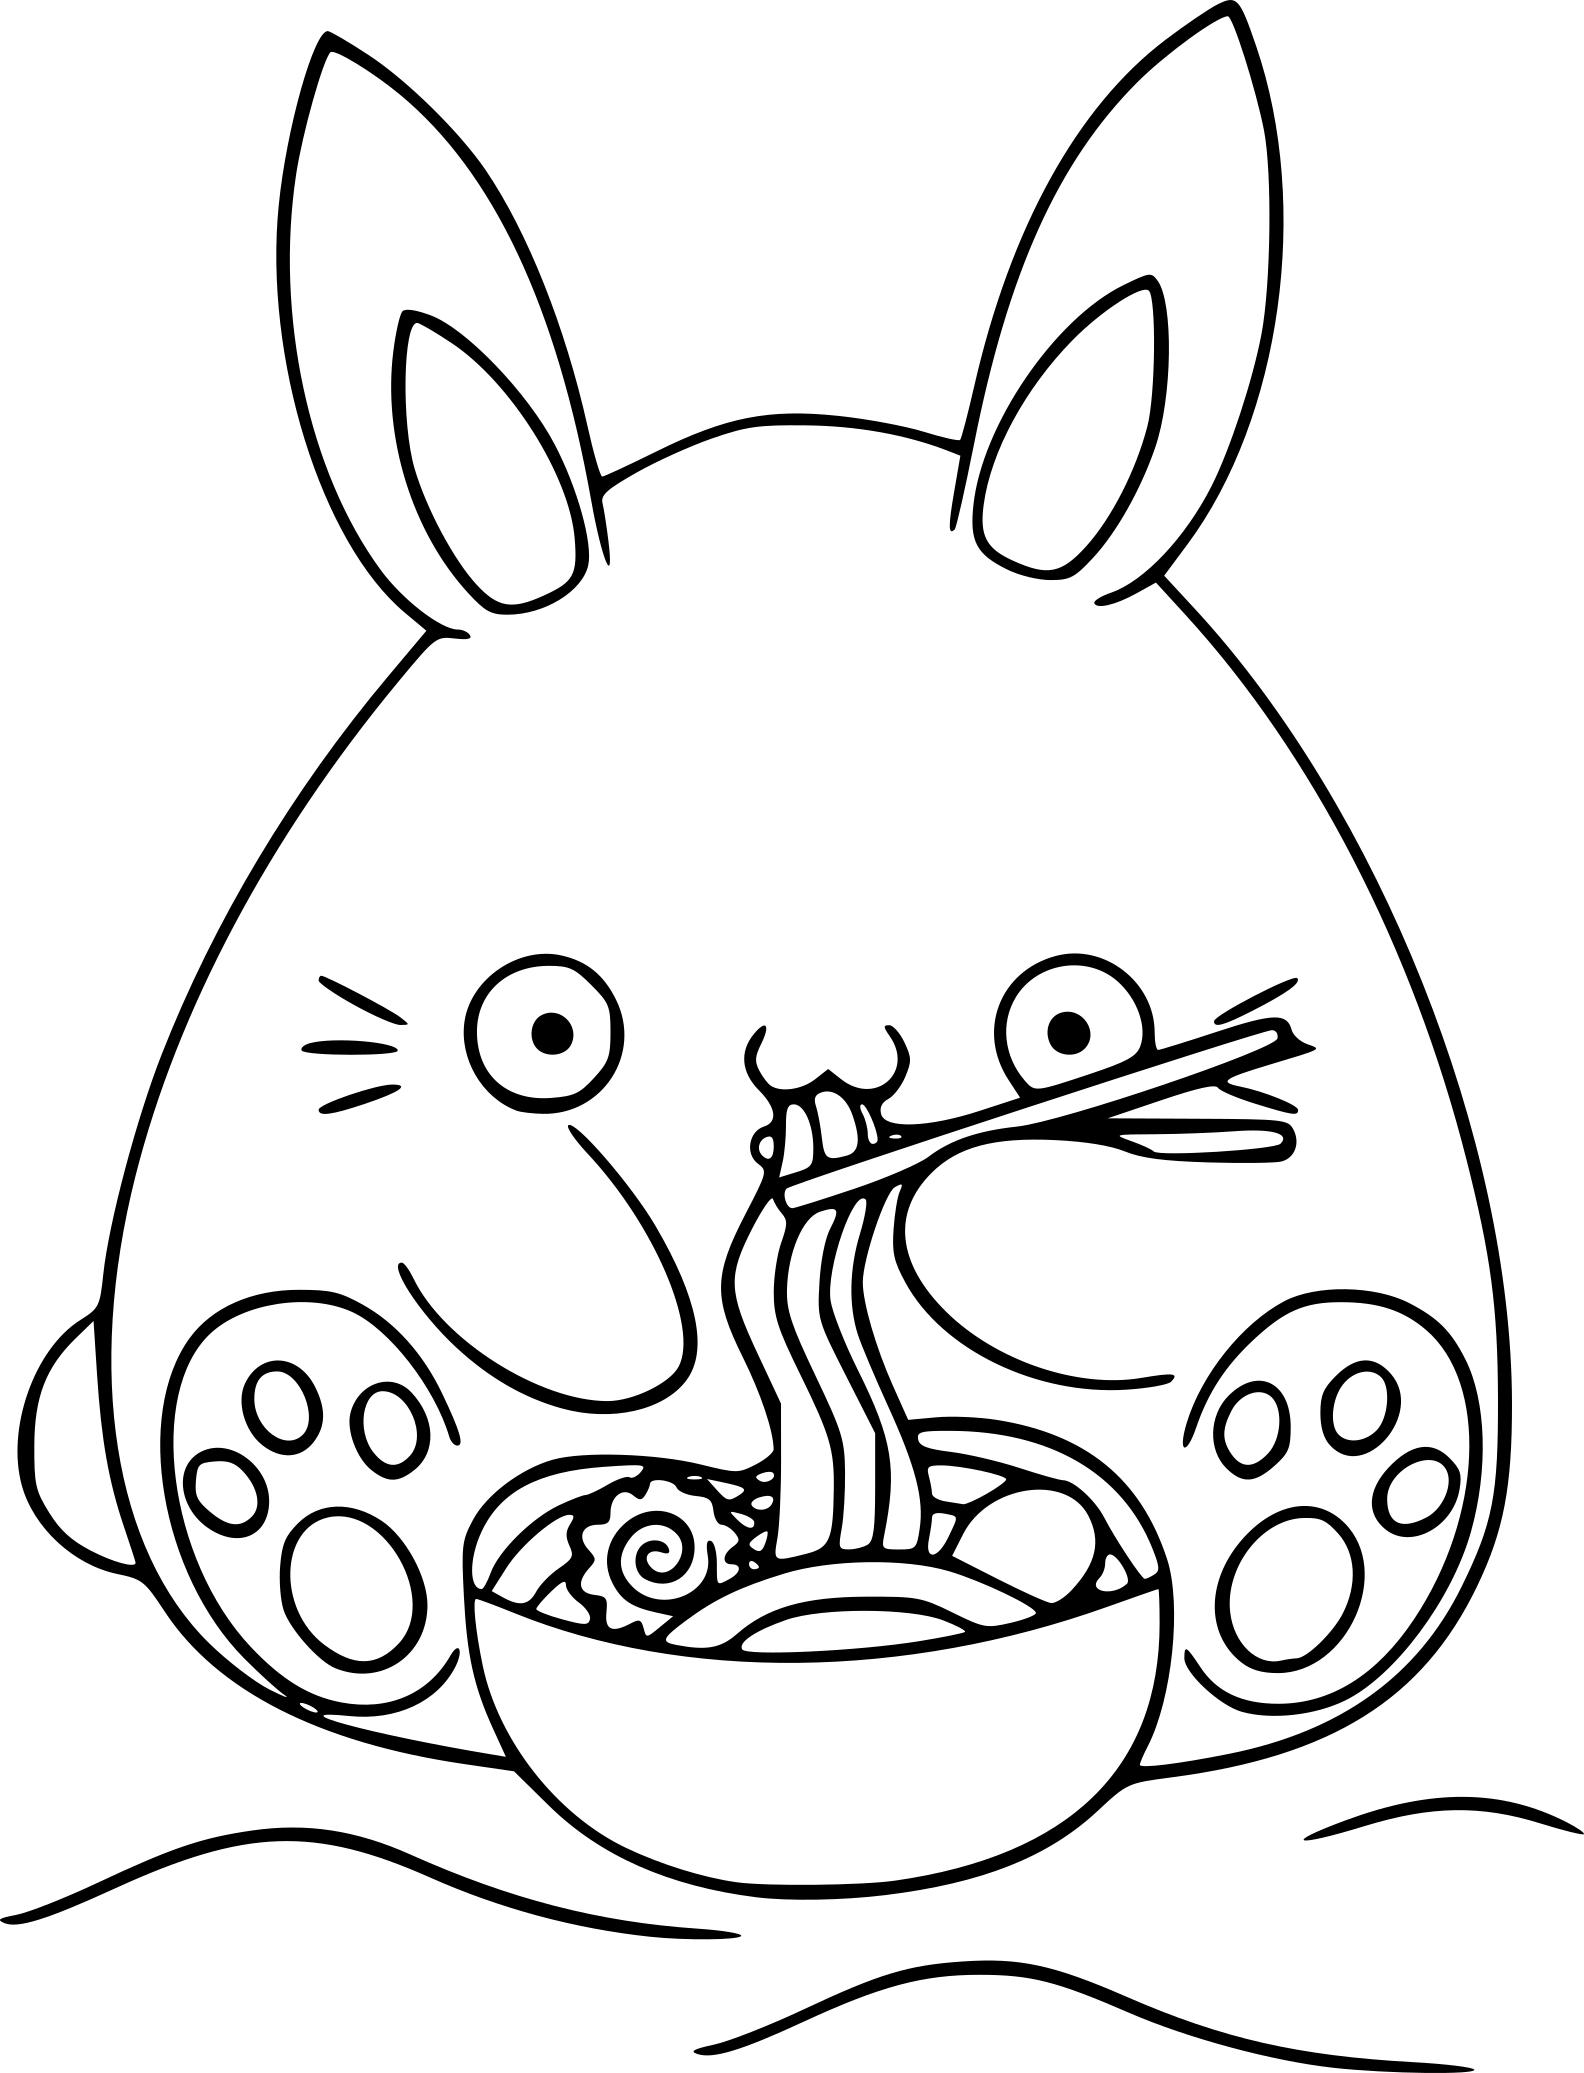 1584x2073 Kawaii Coloring Pages Bunny